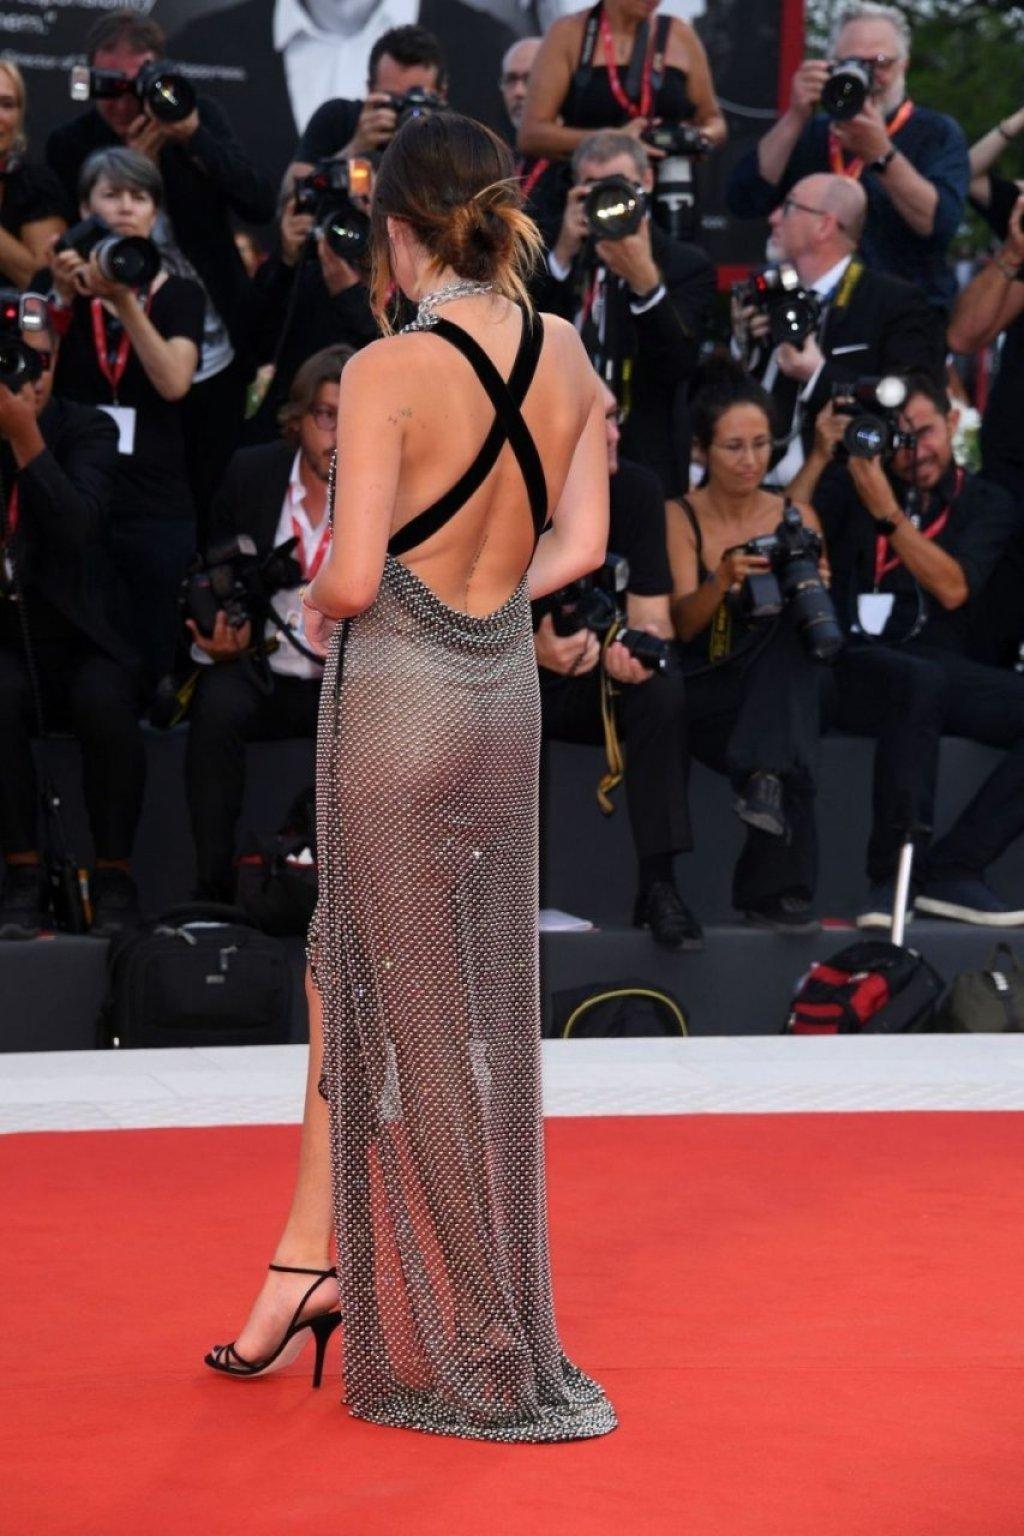 Bella Thorne See Through (85 Photos)